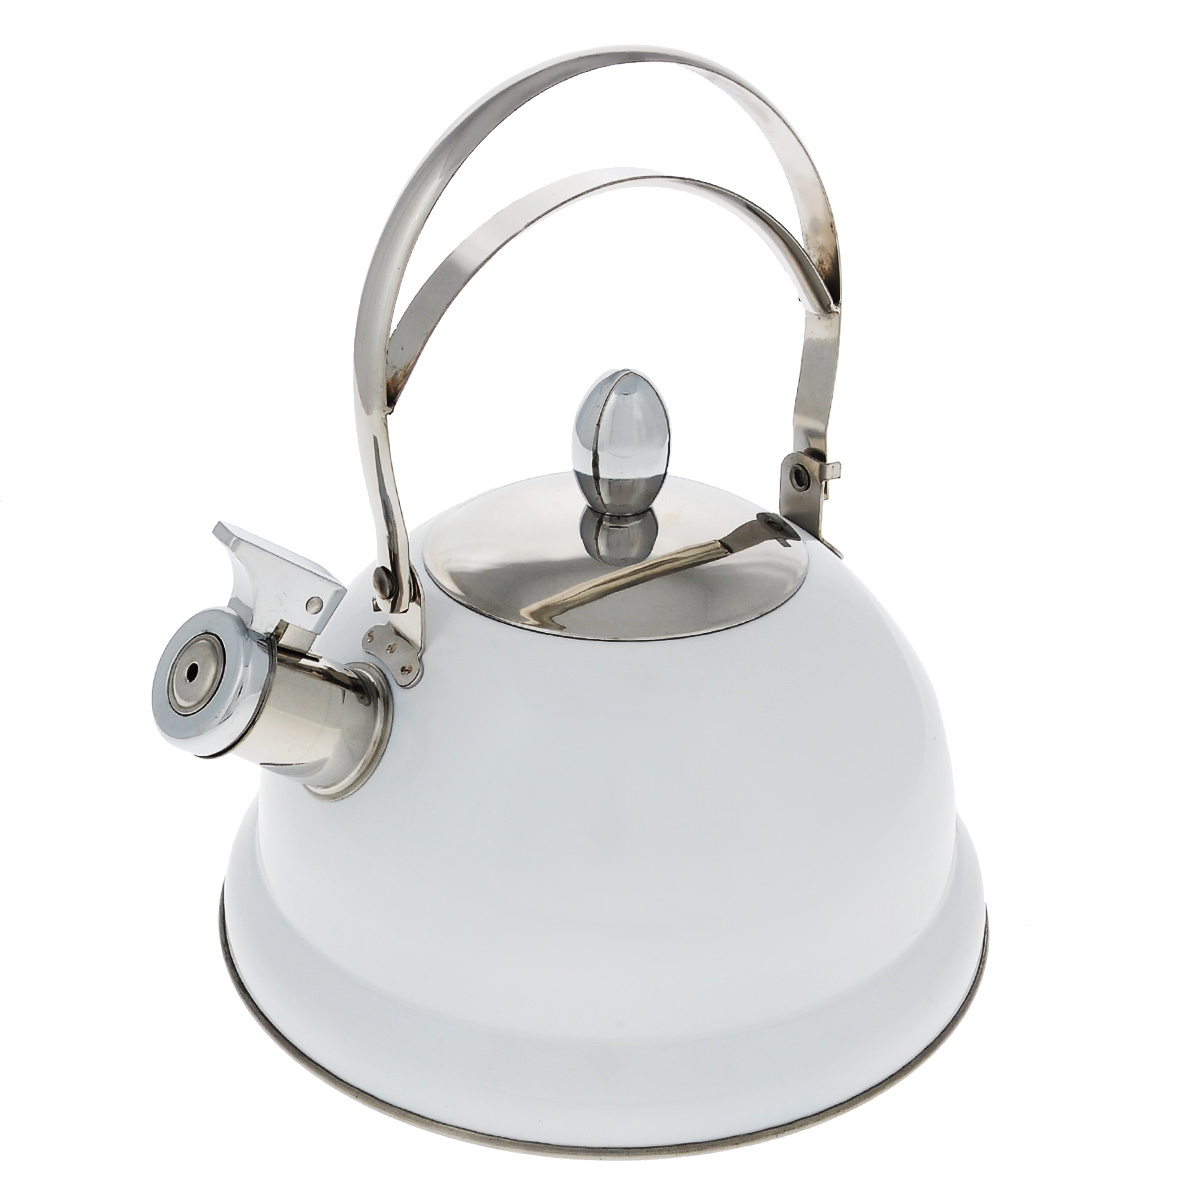 чайник bekker de luxe bk s576 Чайник Bekker De Luxe, со свистком, цвет: белый, 2,6 л. BK-S408